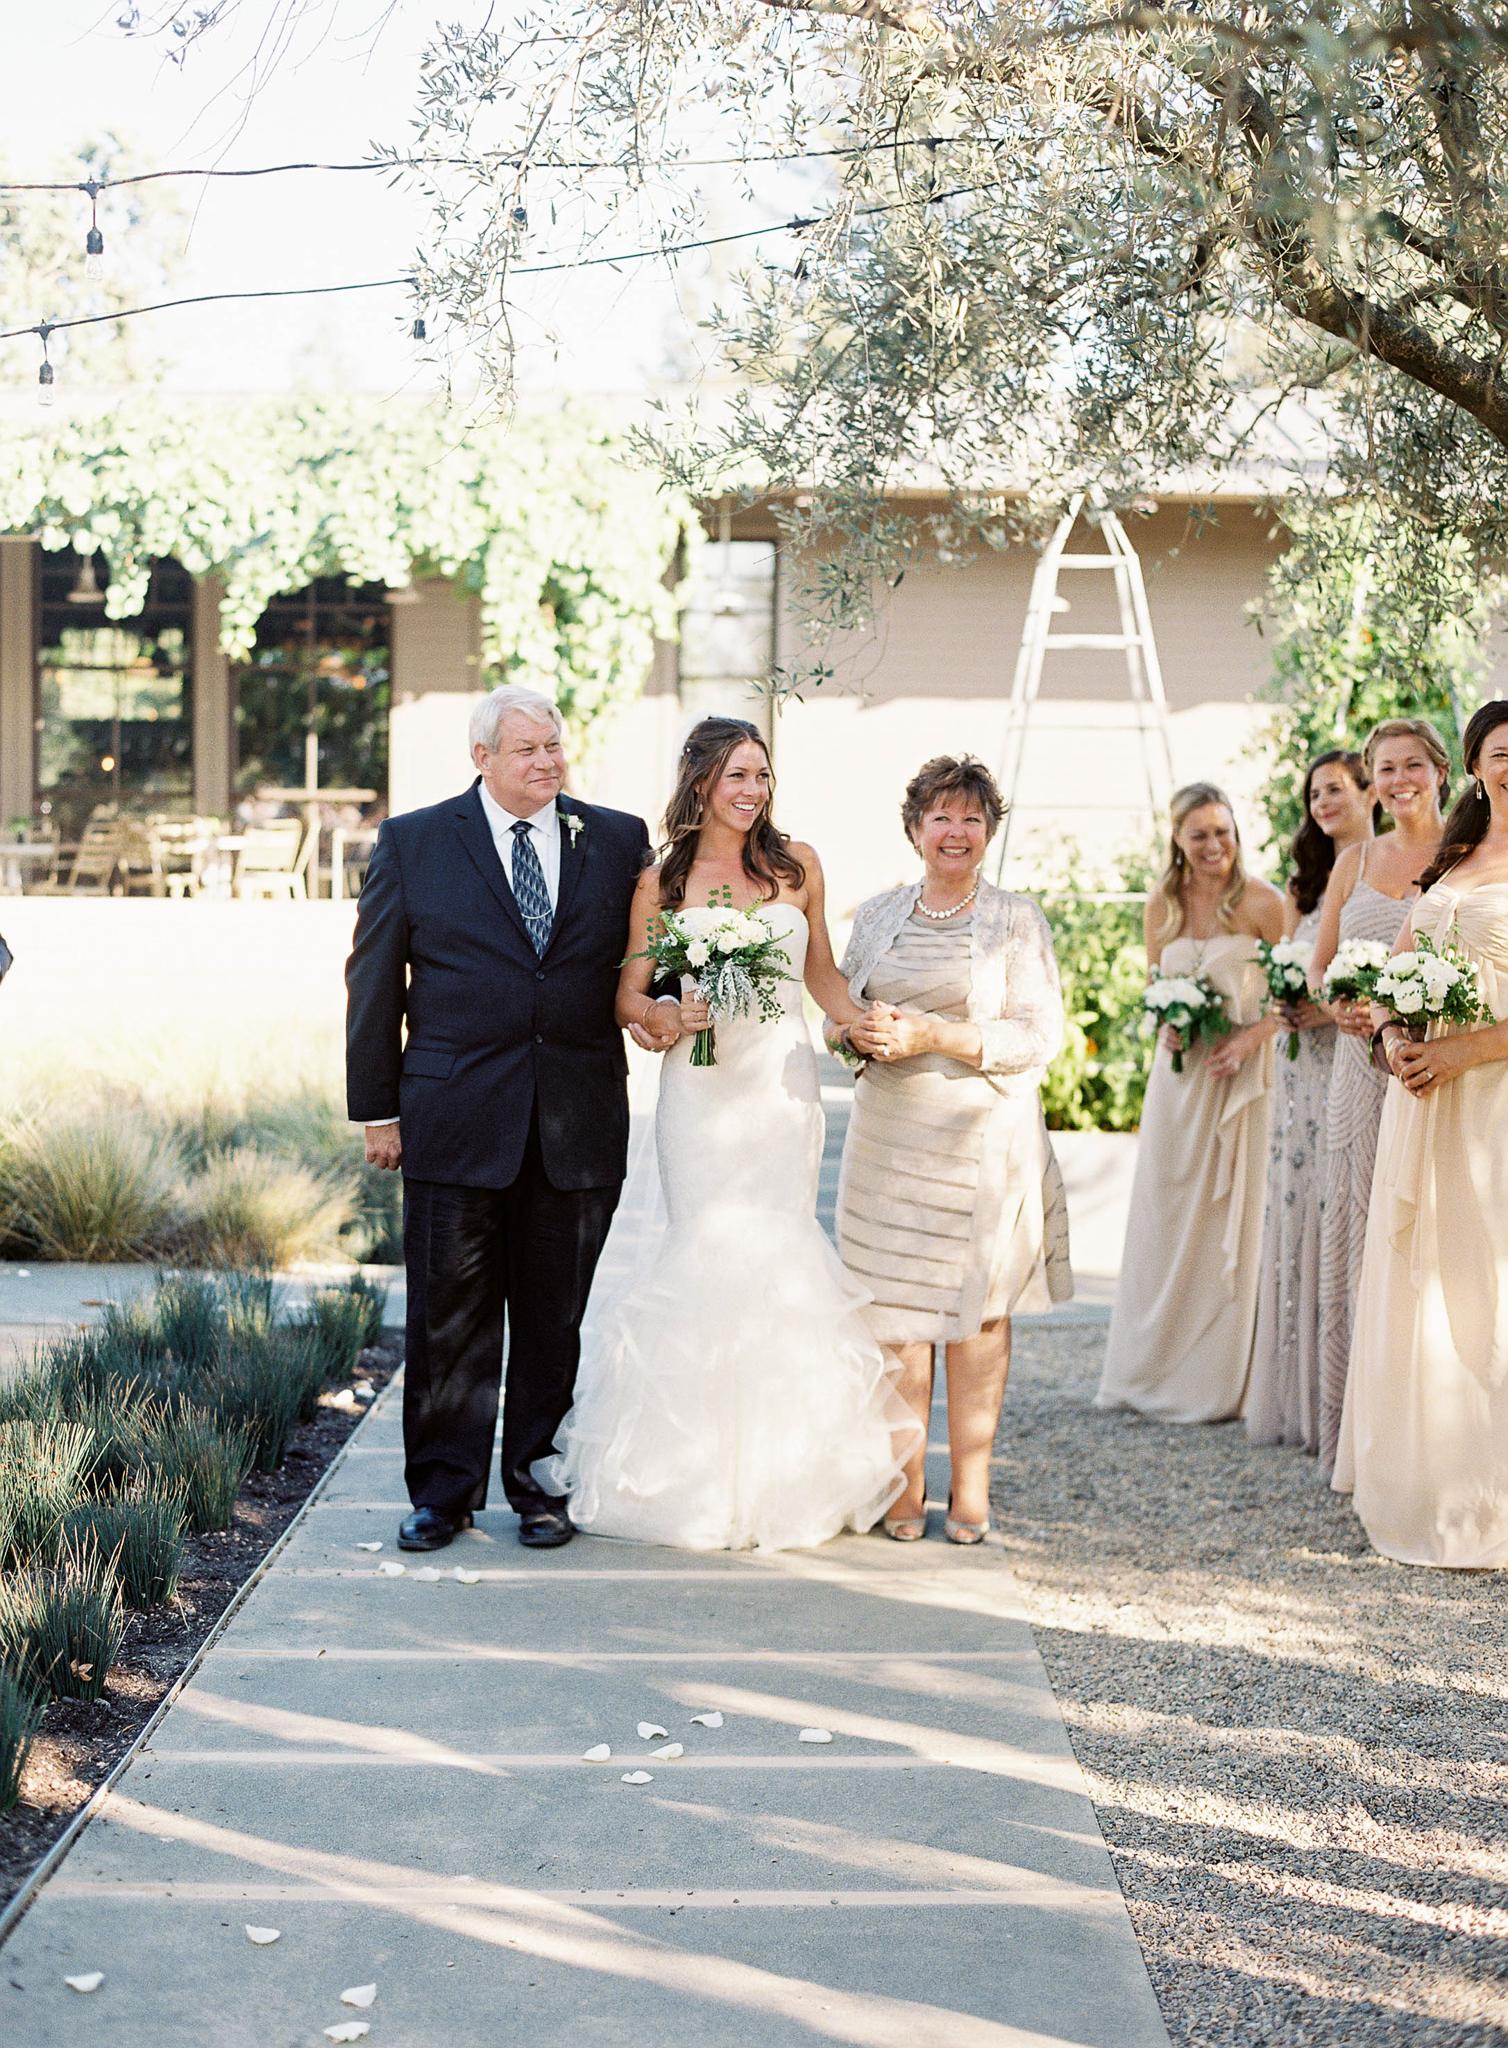 Meghan Mehan Photography - Fine Art Film Wedding Photography - San Francisco   Napa   Sonoma   Big Sur   Chicago   Minneapolis   Milwaukee   Lake Geneva   Door County   Wisconsin 017.jpg